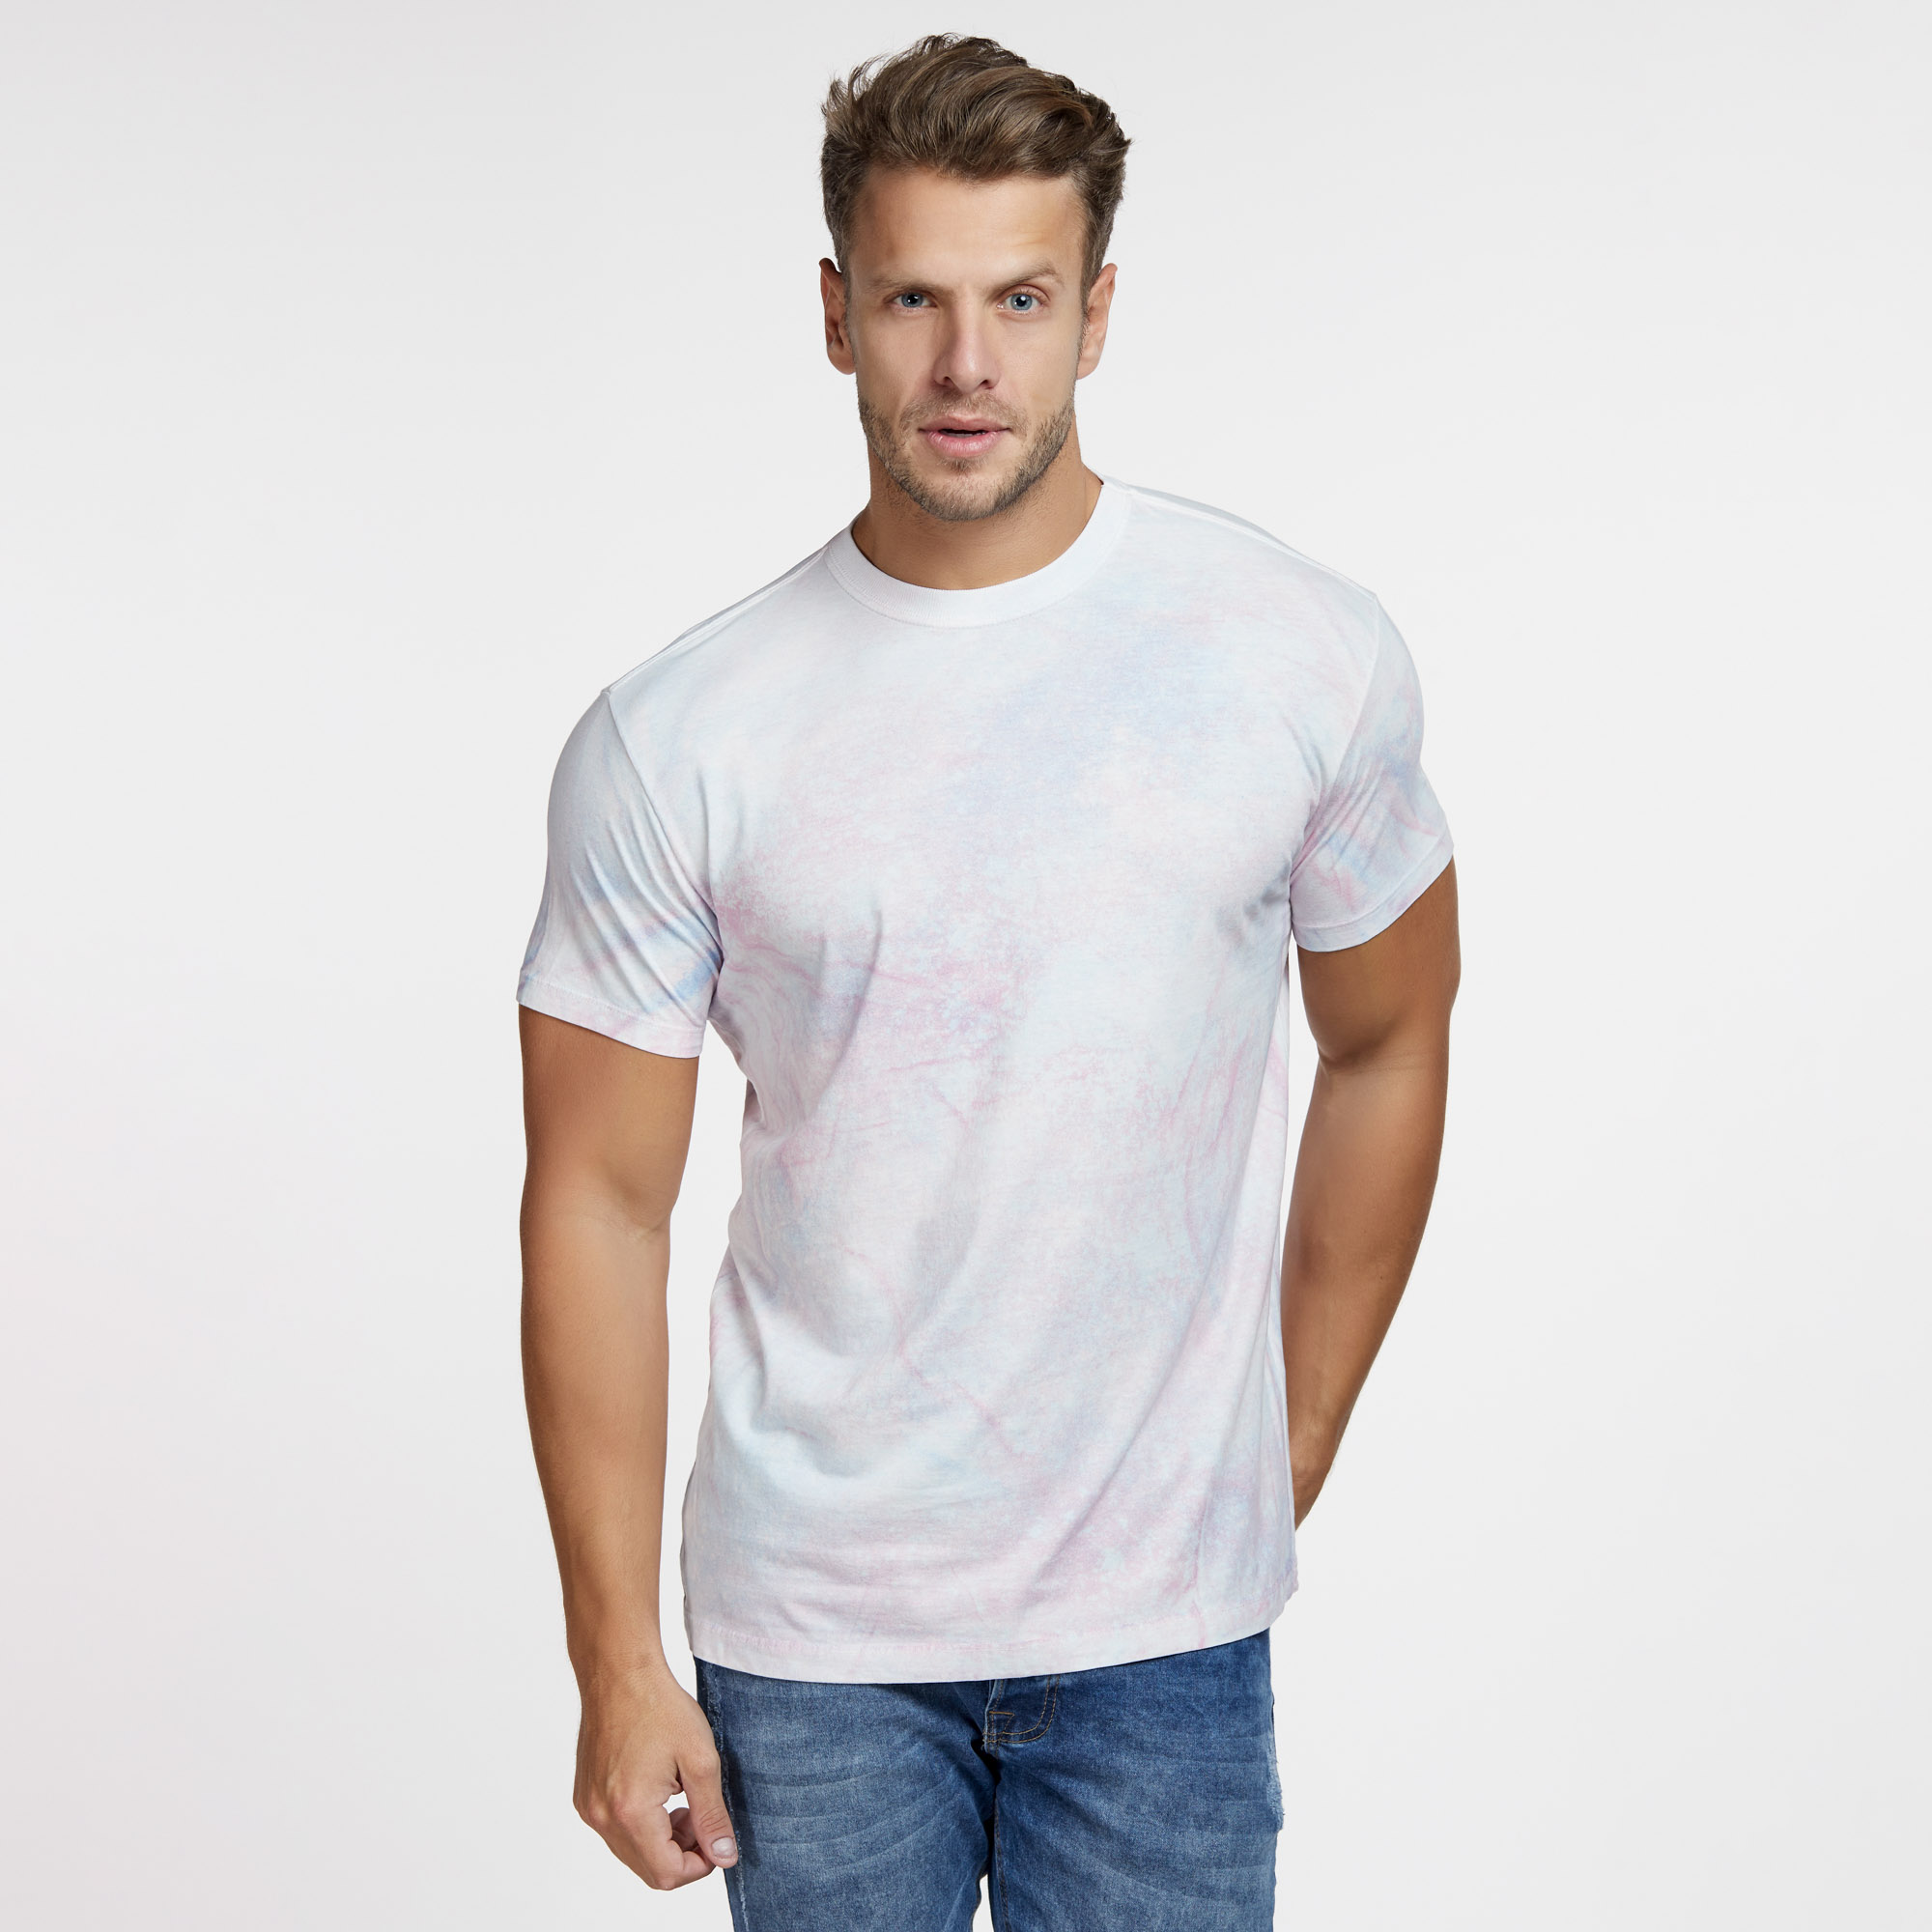 Camiseta Masculina Galaxy Total Branca